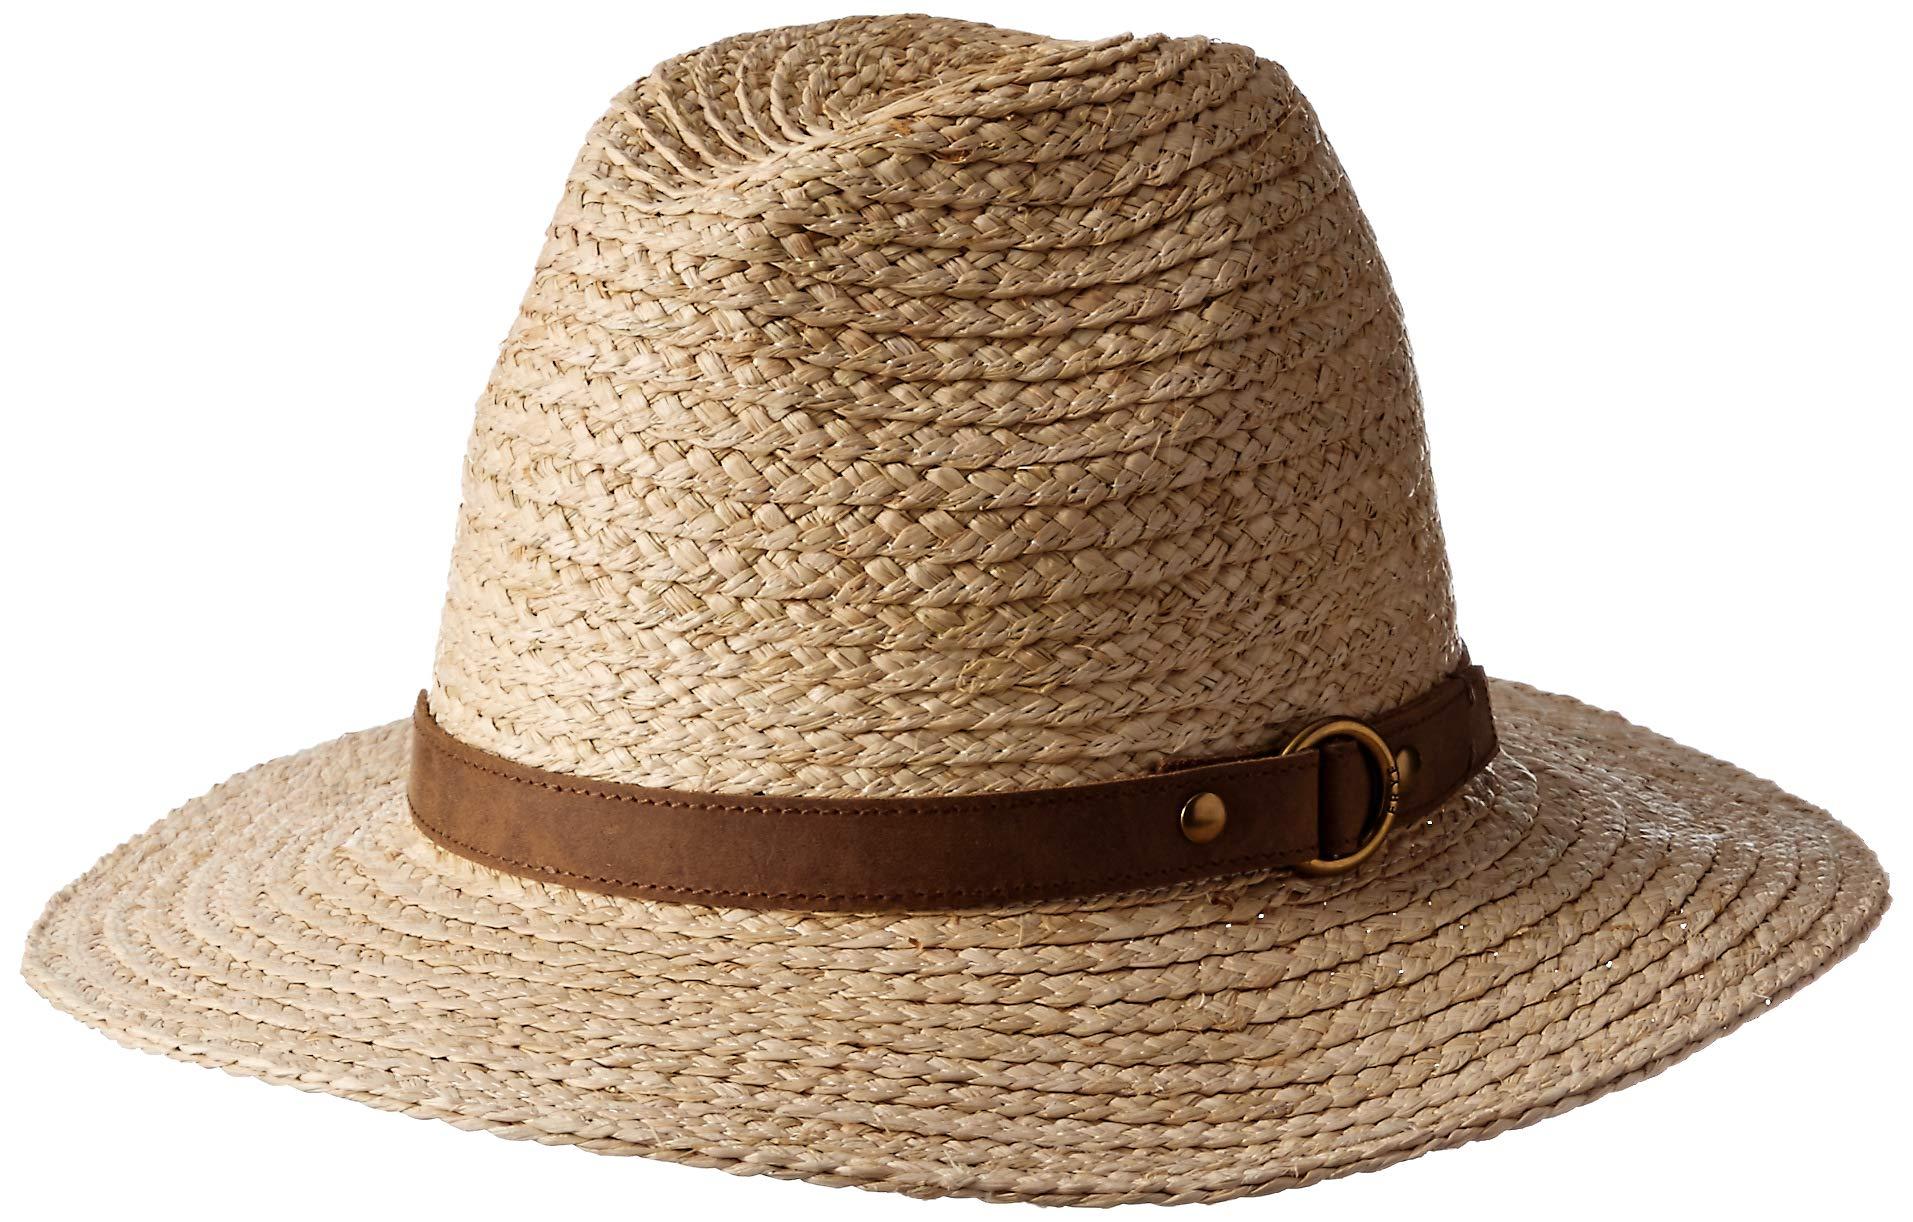 Frye Headwear Women's Frye Raffia Harness Fedora, Sand Small/Medium